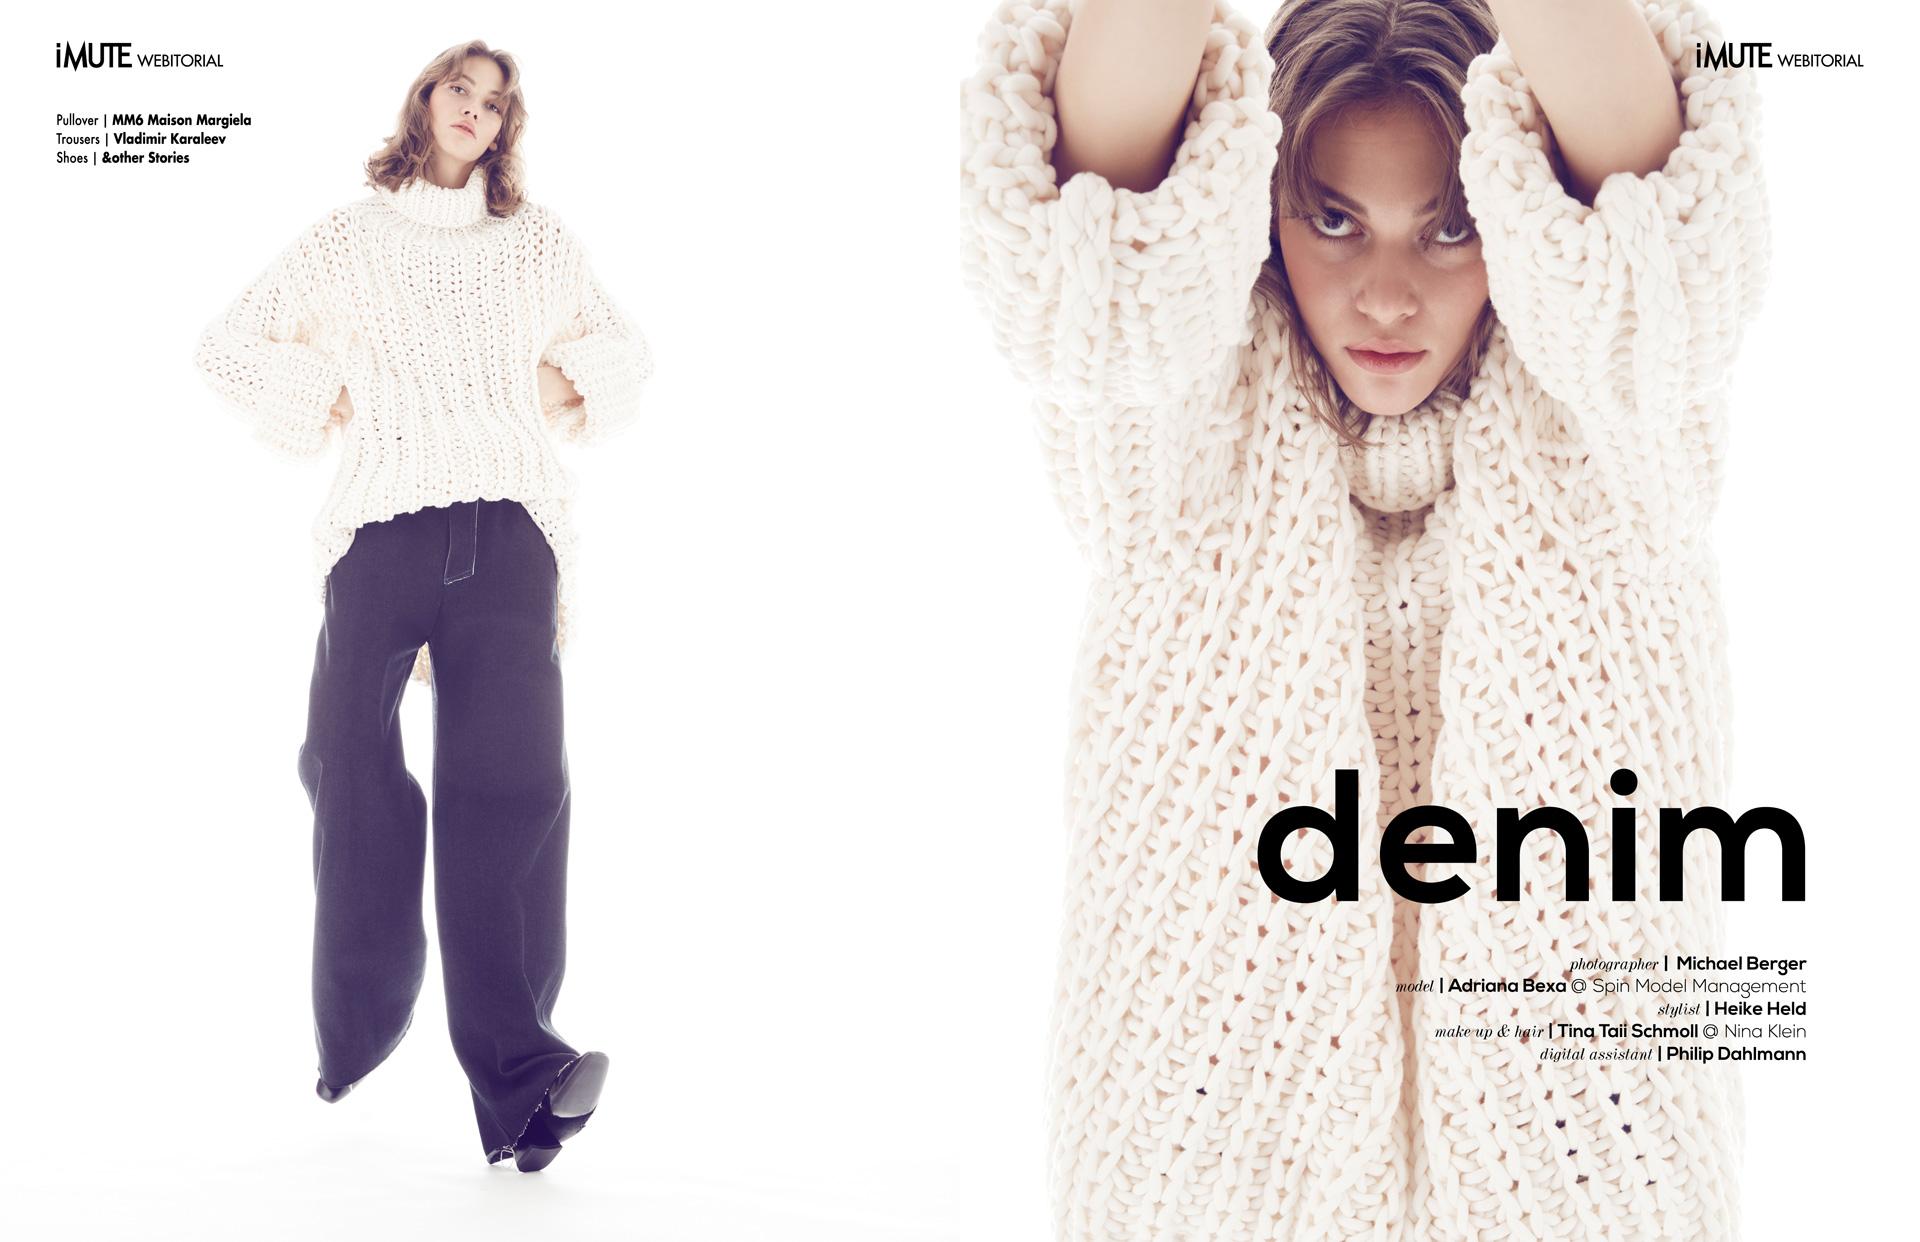 Denim webitorial for iMute Magazine Photographer|Michael Berger Model| Adriana Bexa @Spin Model Management Stylist|Heike Held Makeup & Hair|Tina Taii Schmoll @ Nina Klein Digital Assitant| Philip Dahlmannl